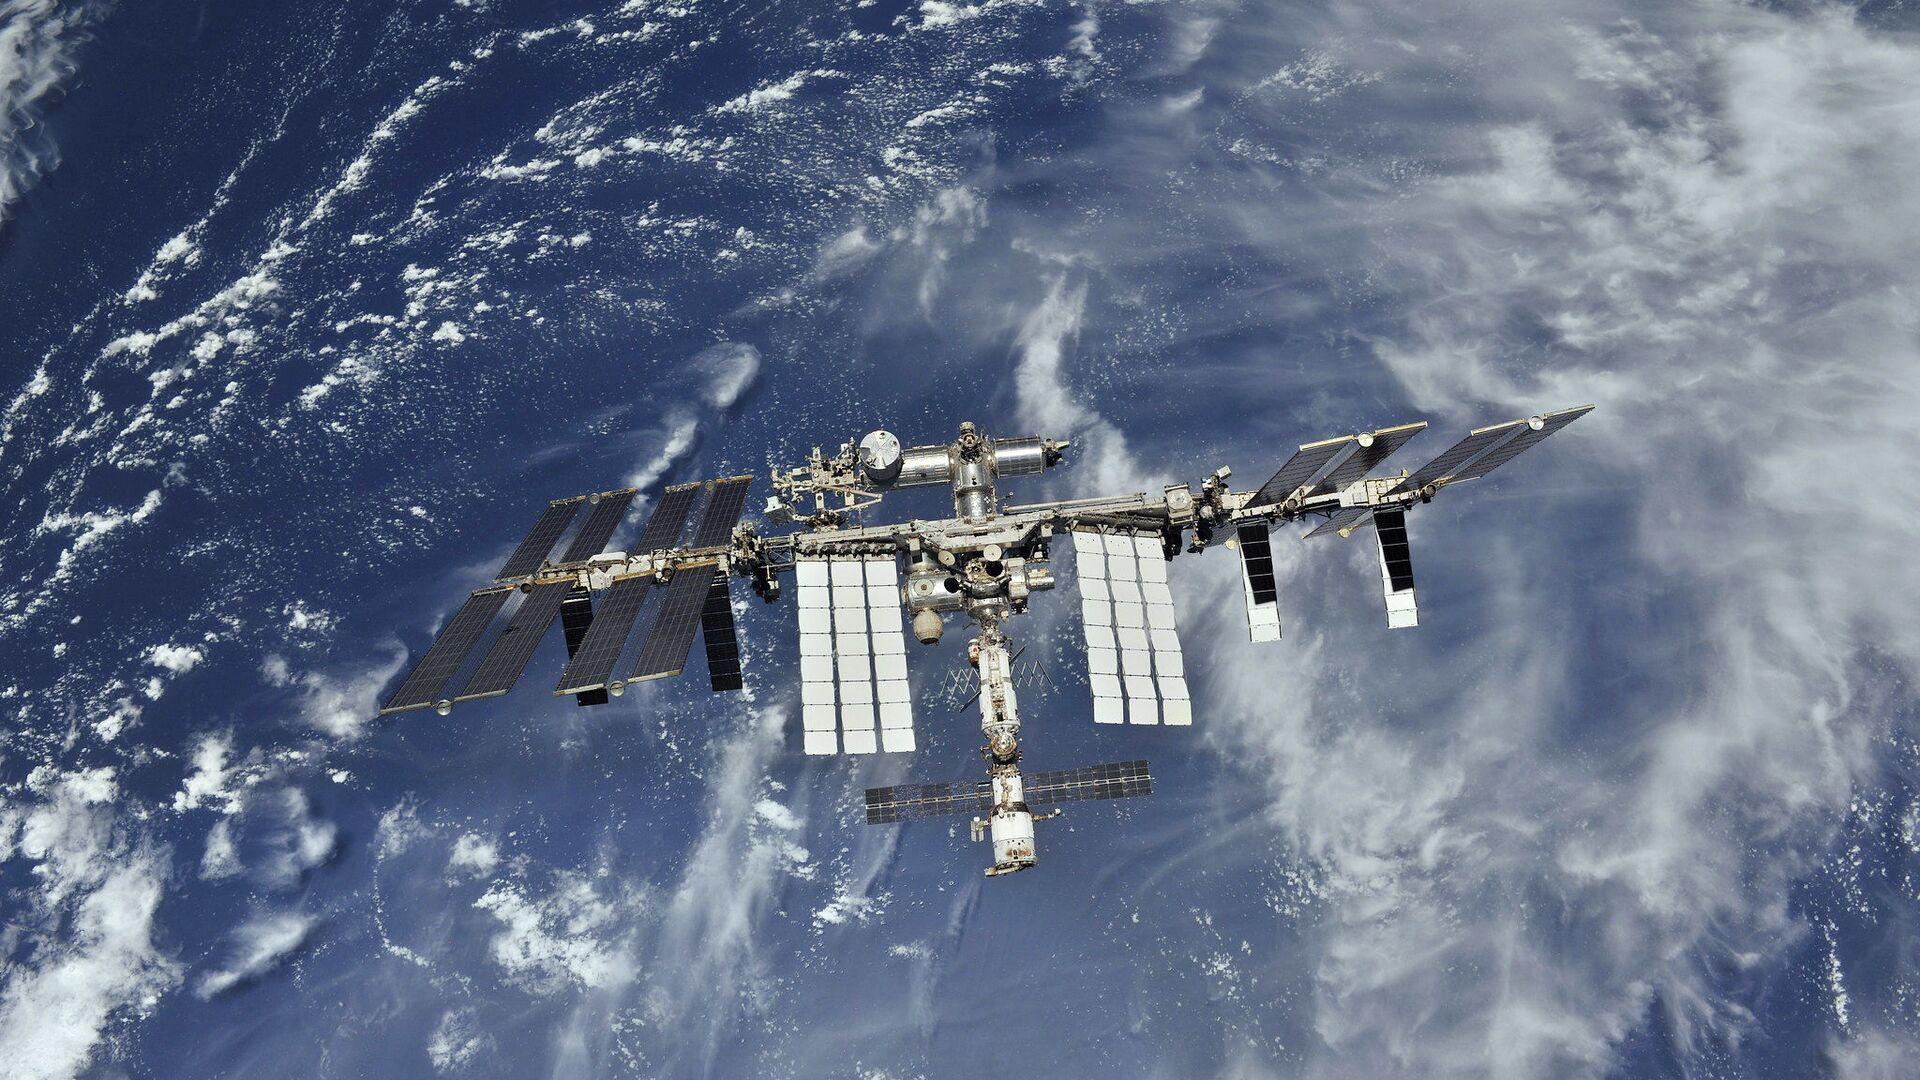 Estación Espacial Internacional (EEI) - Sputnik Mundo, 1920, 29.07.2021